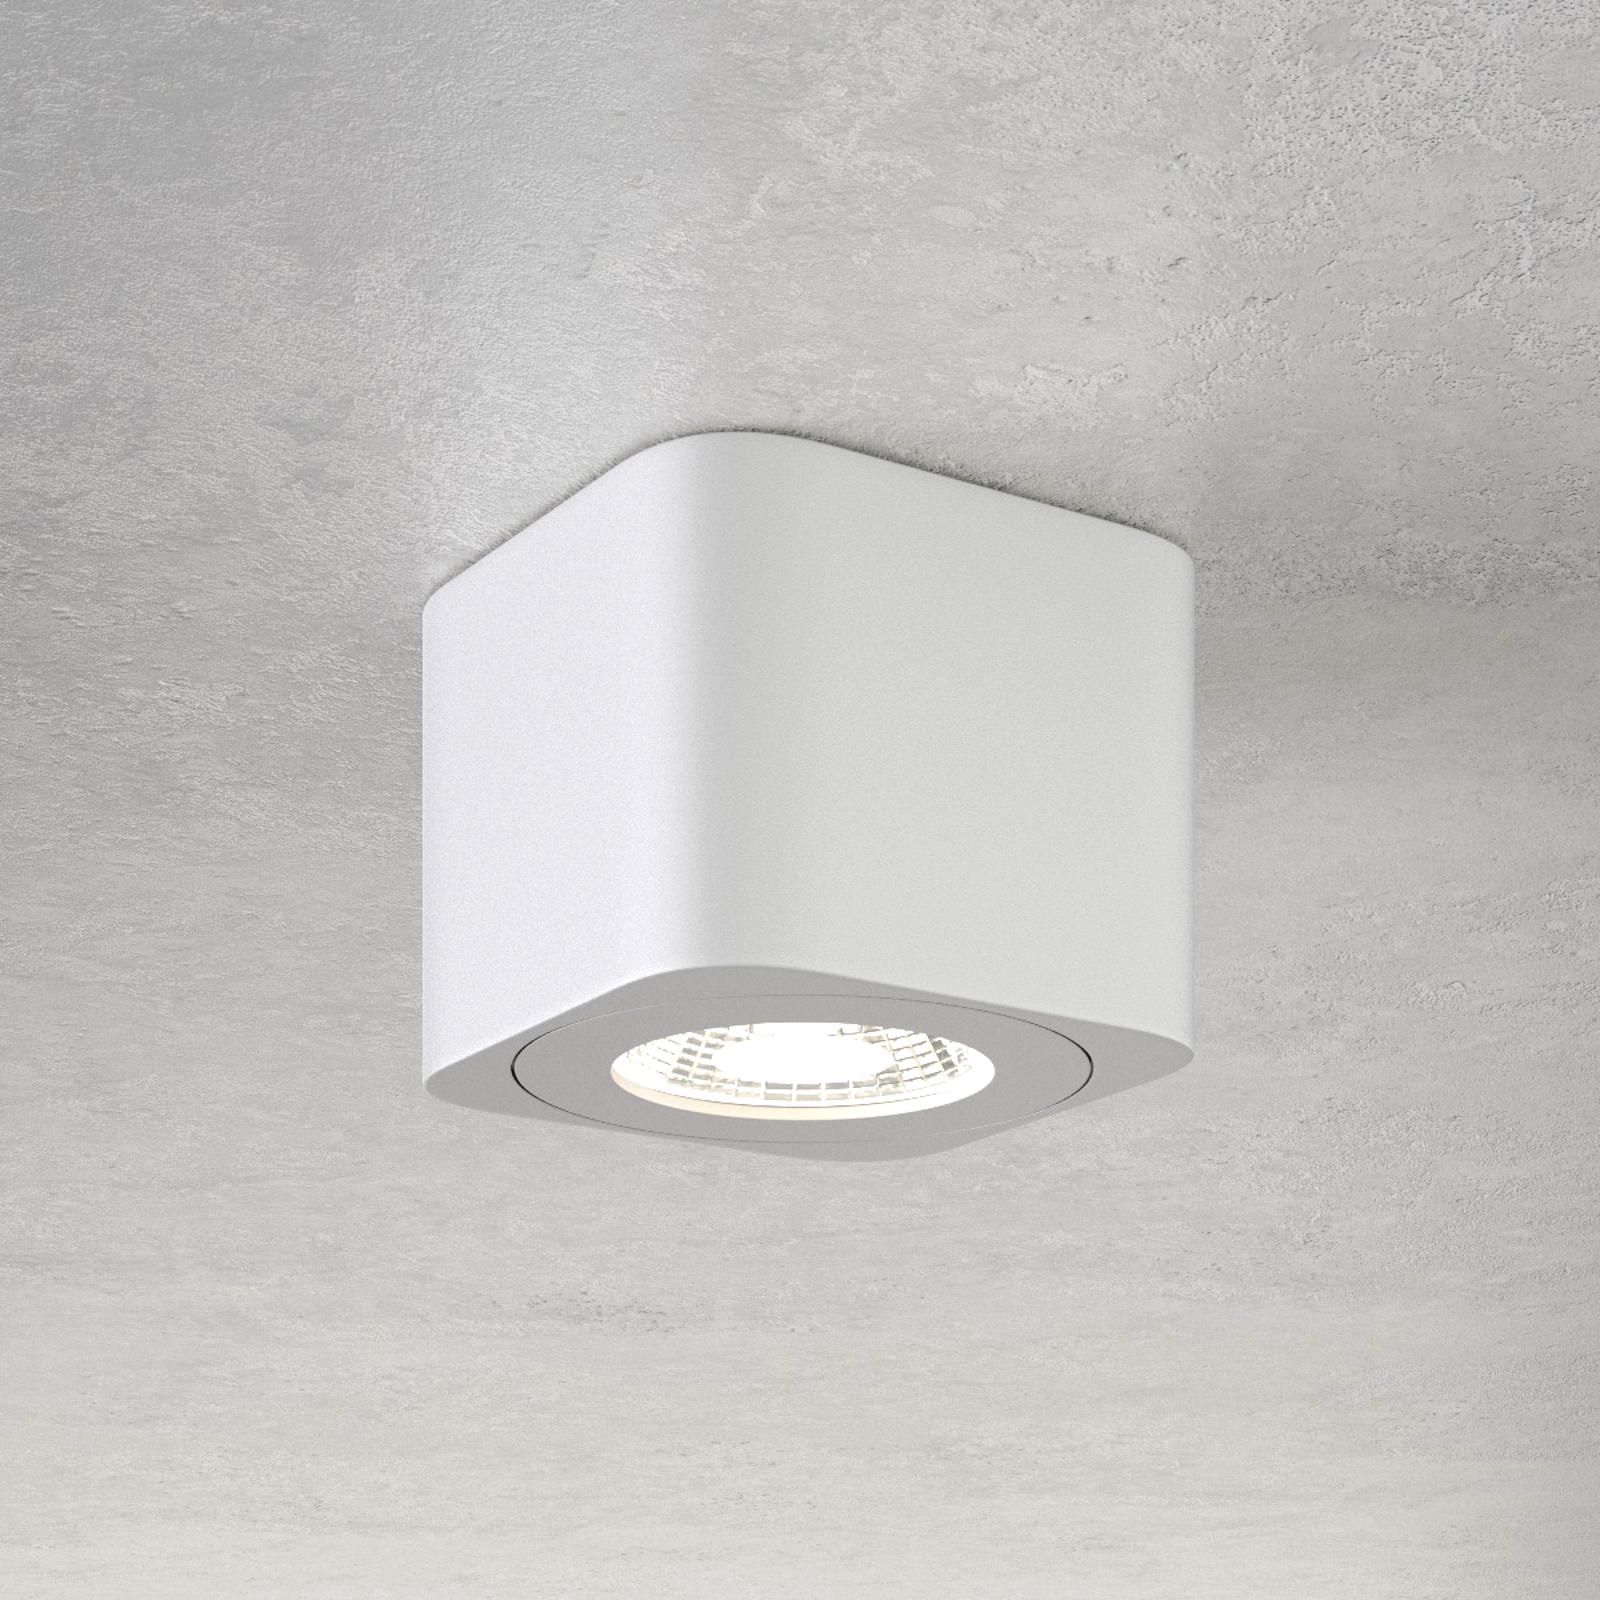 Vierkant LED downlight Palmi in wit